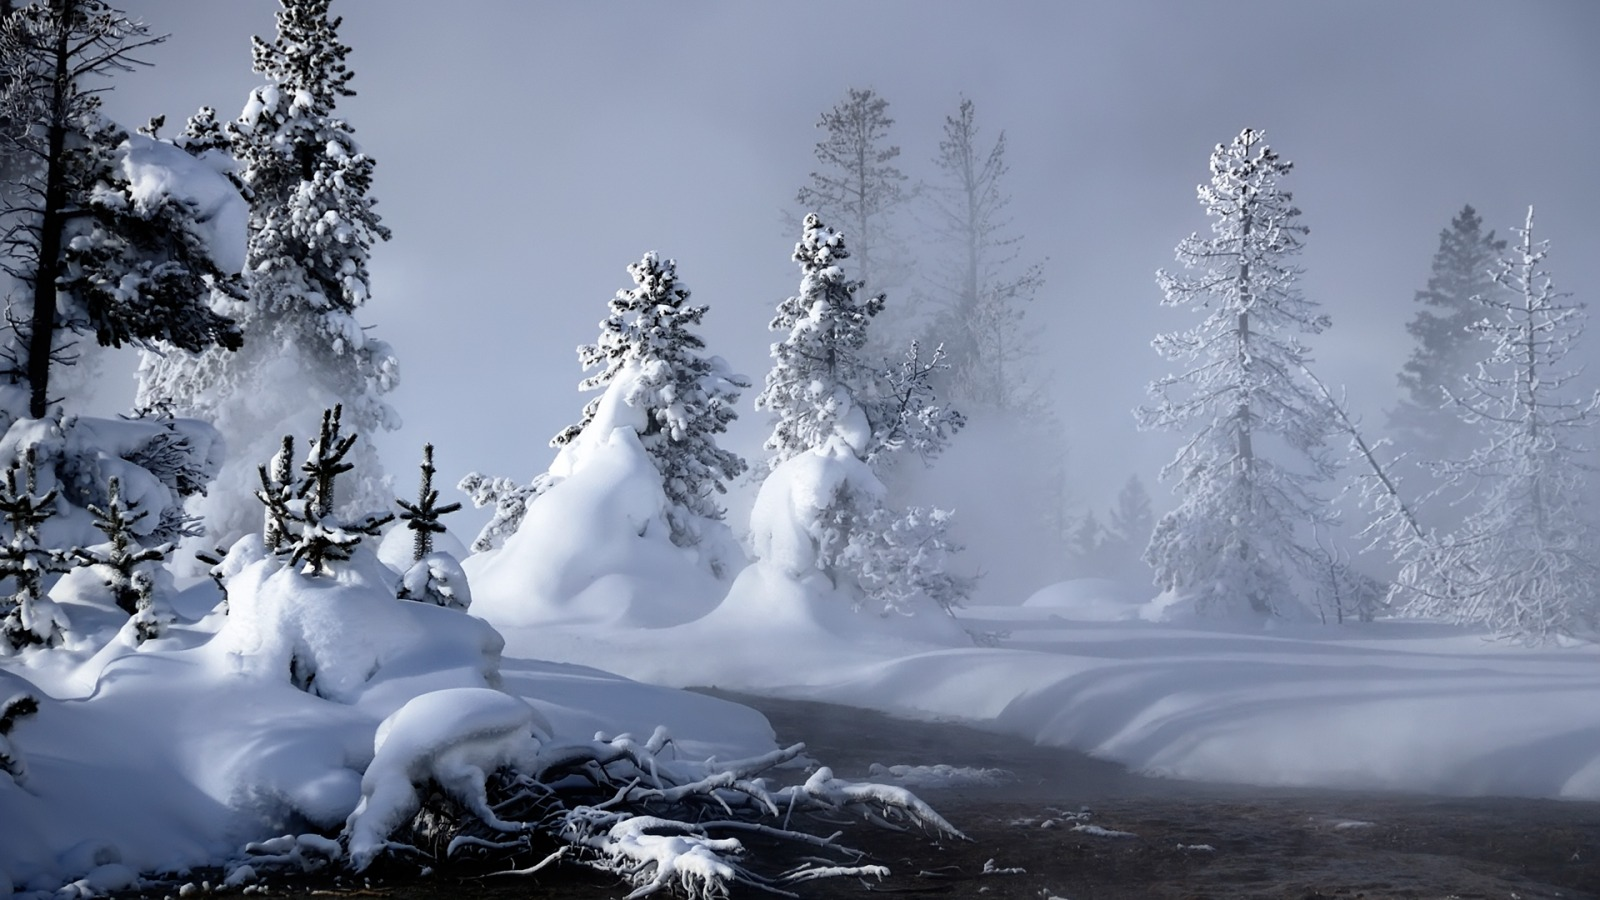 Mystic Winter Wallpaper Winter Nature Wallpapers in jpg format for ...